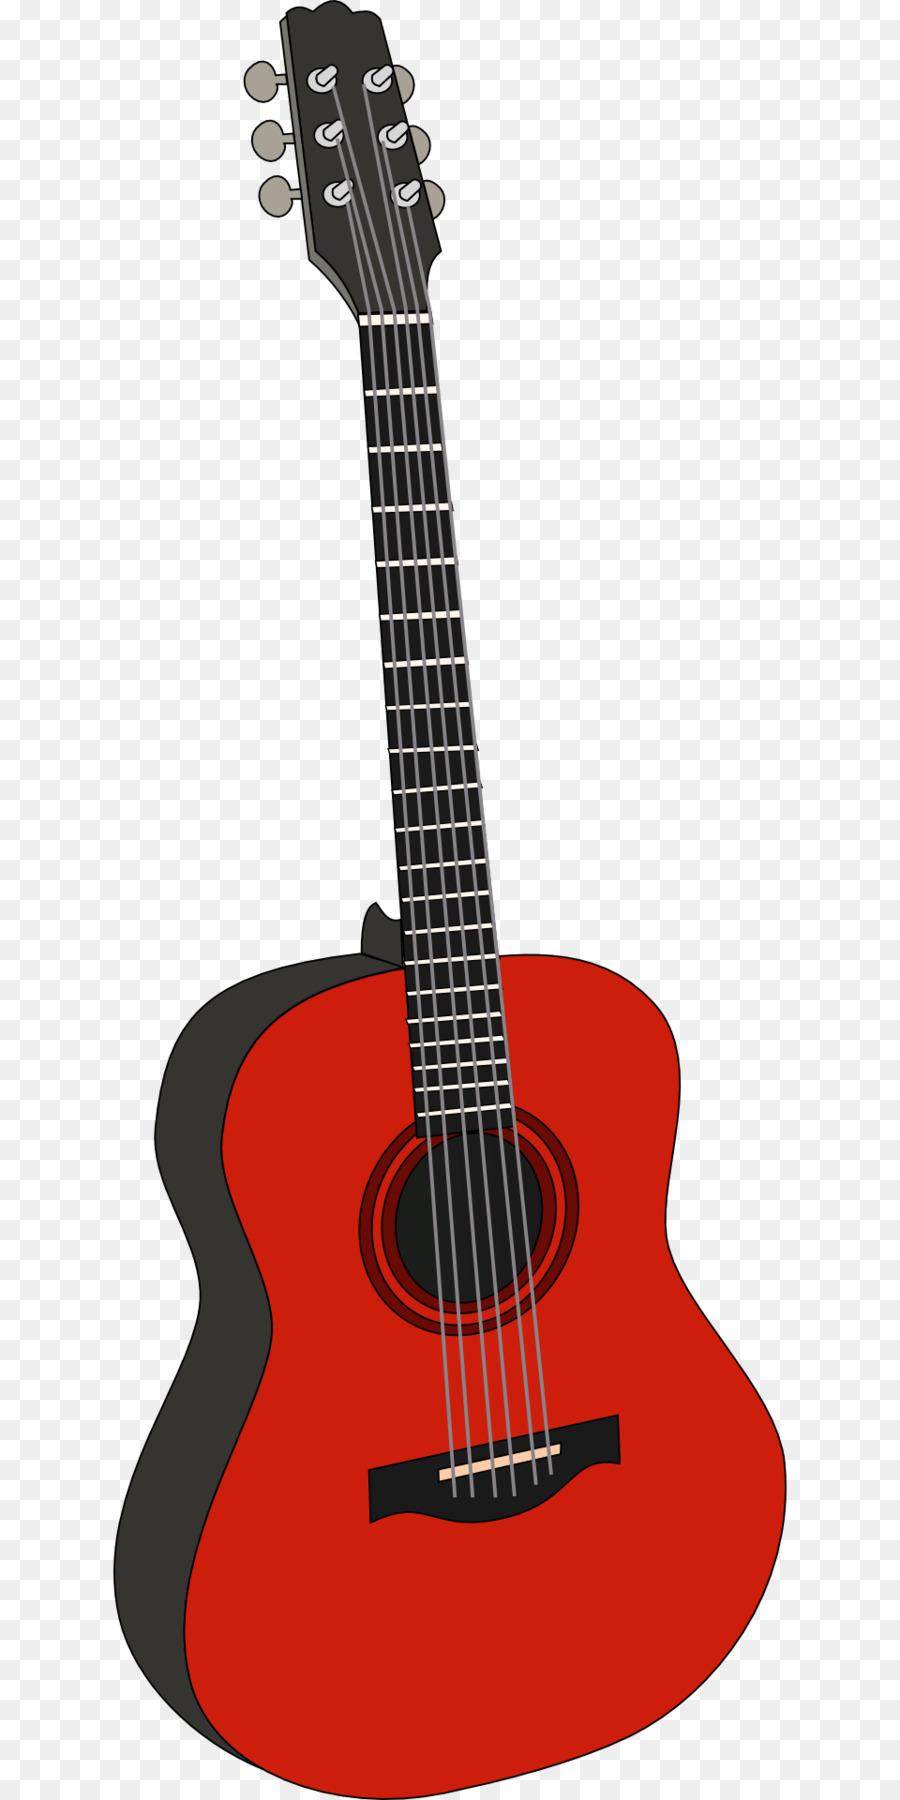 Clipart guitar red guitar. Cartoon illustration transparent